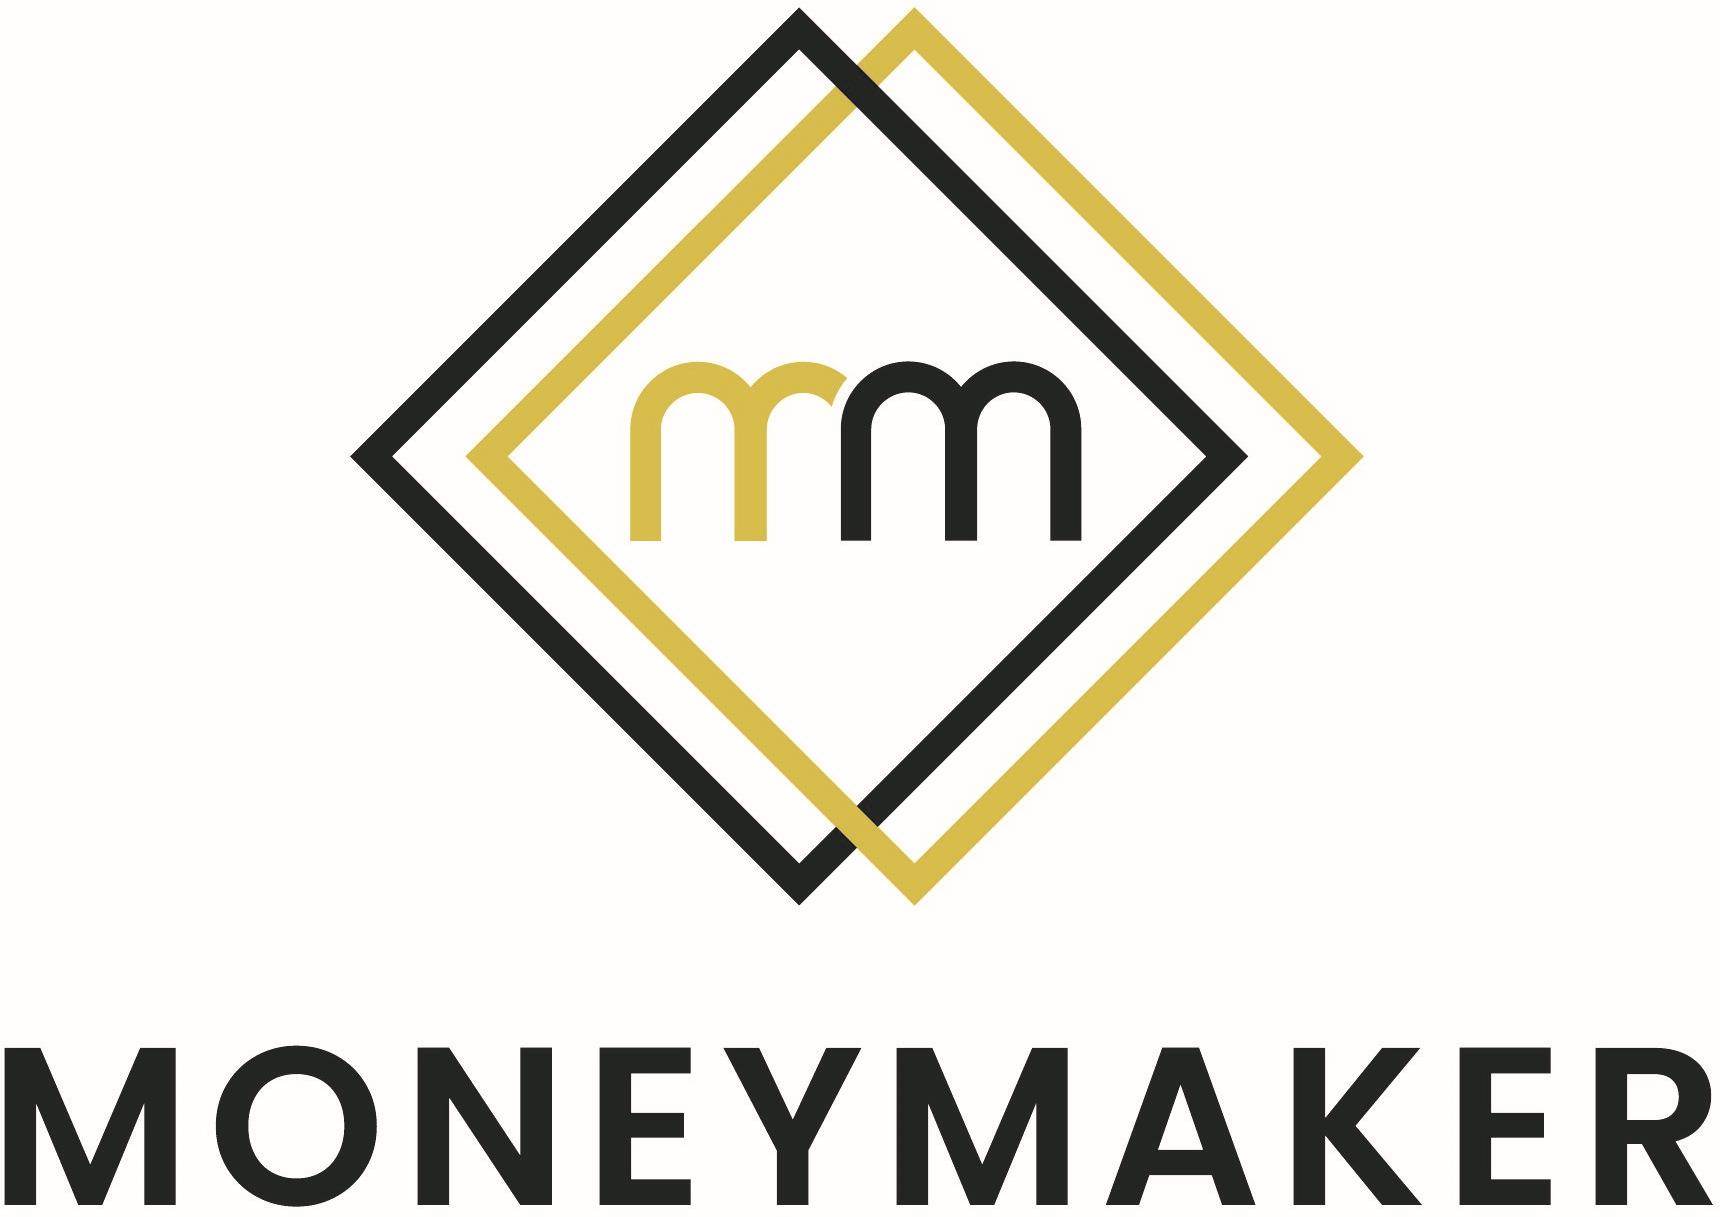 Wort-/Bildmarke: mm MONEYMAKER